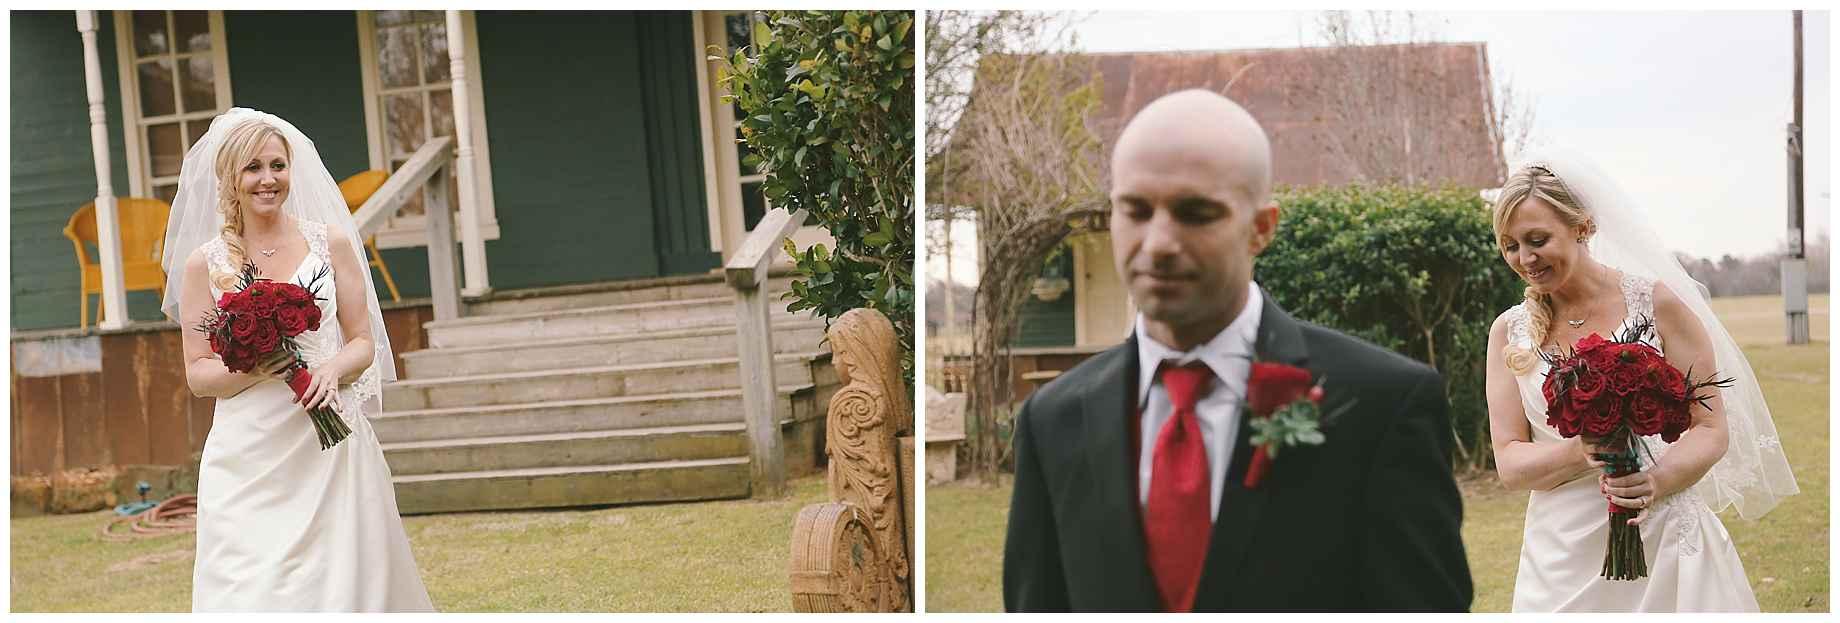 elmwood-gardens-wedding-photos-06